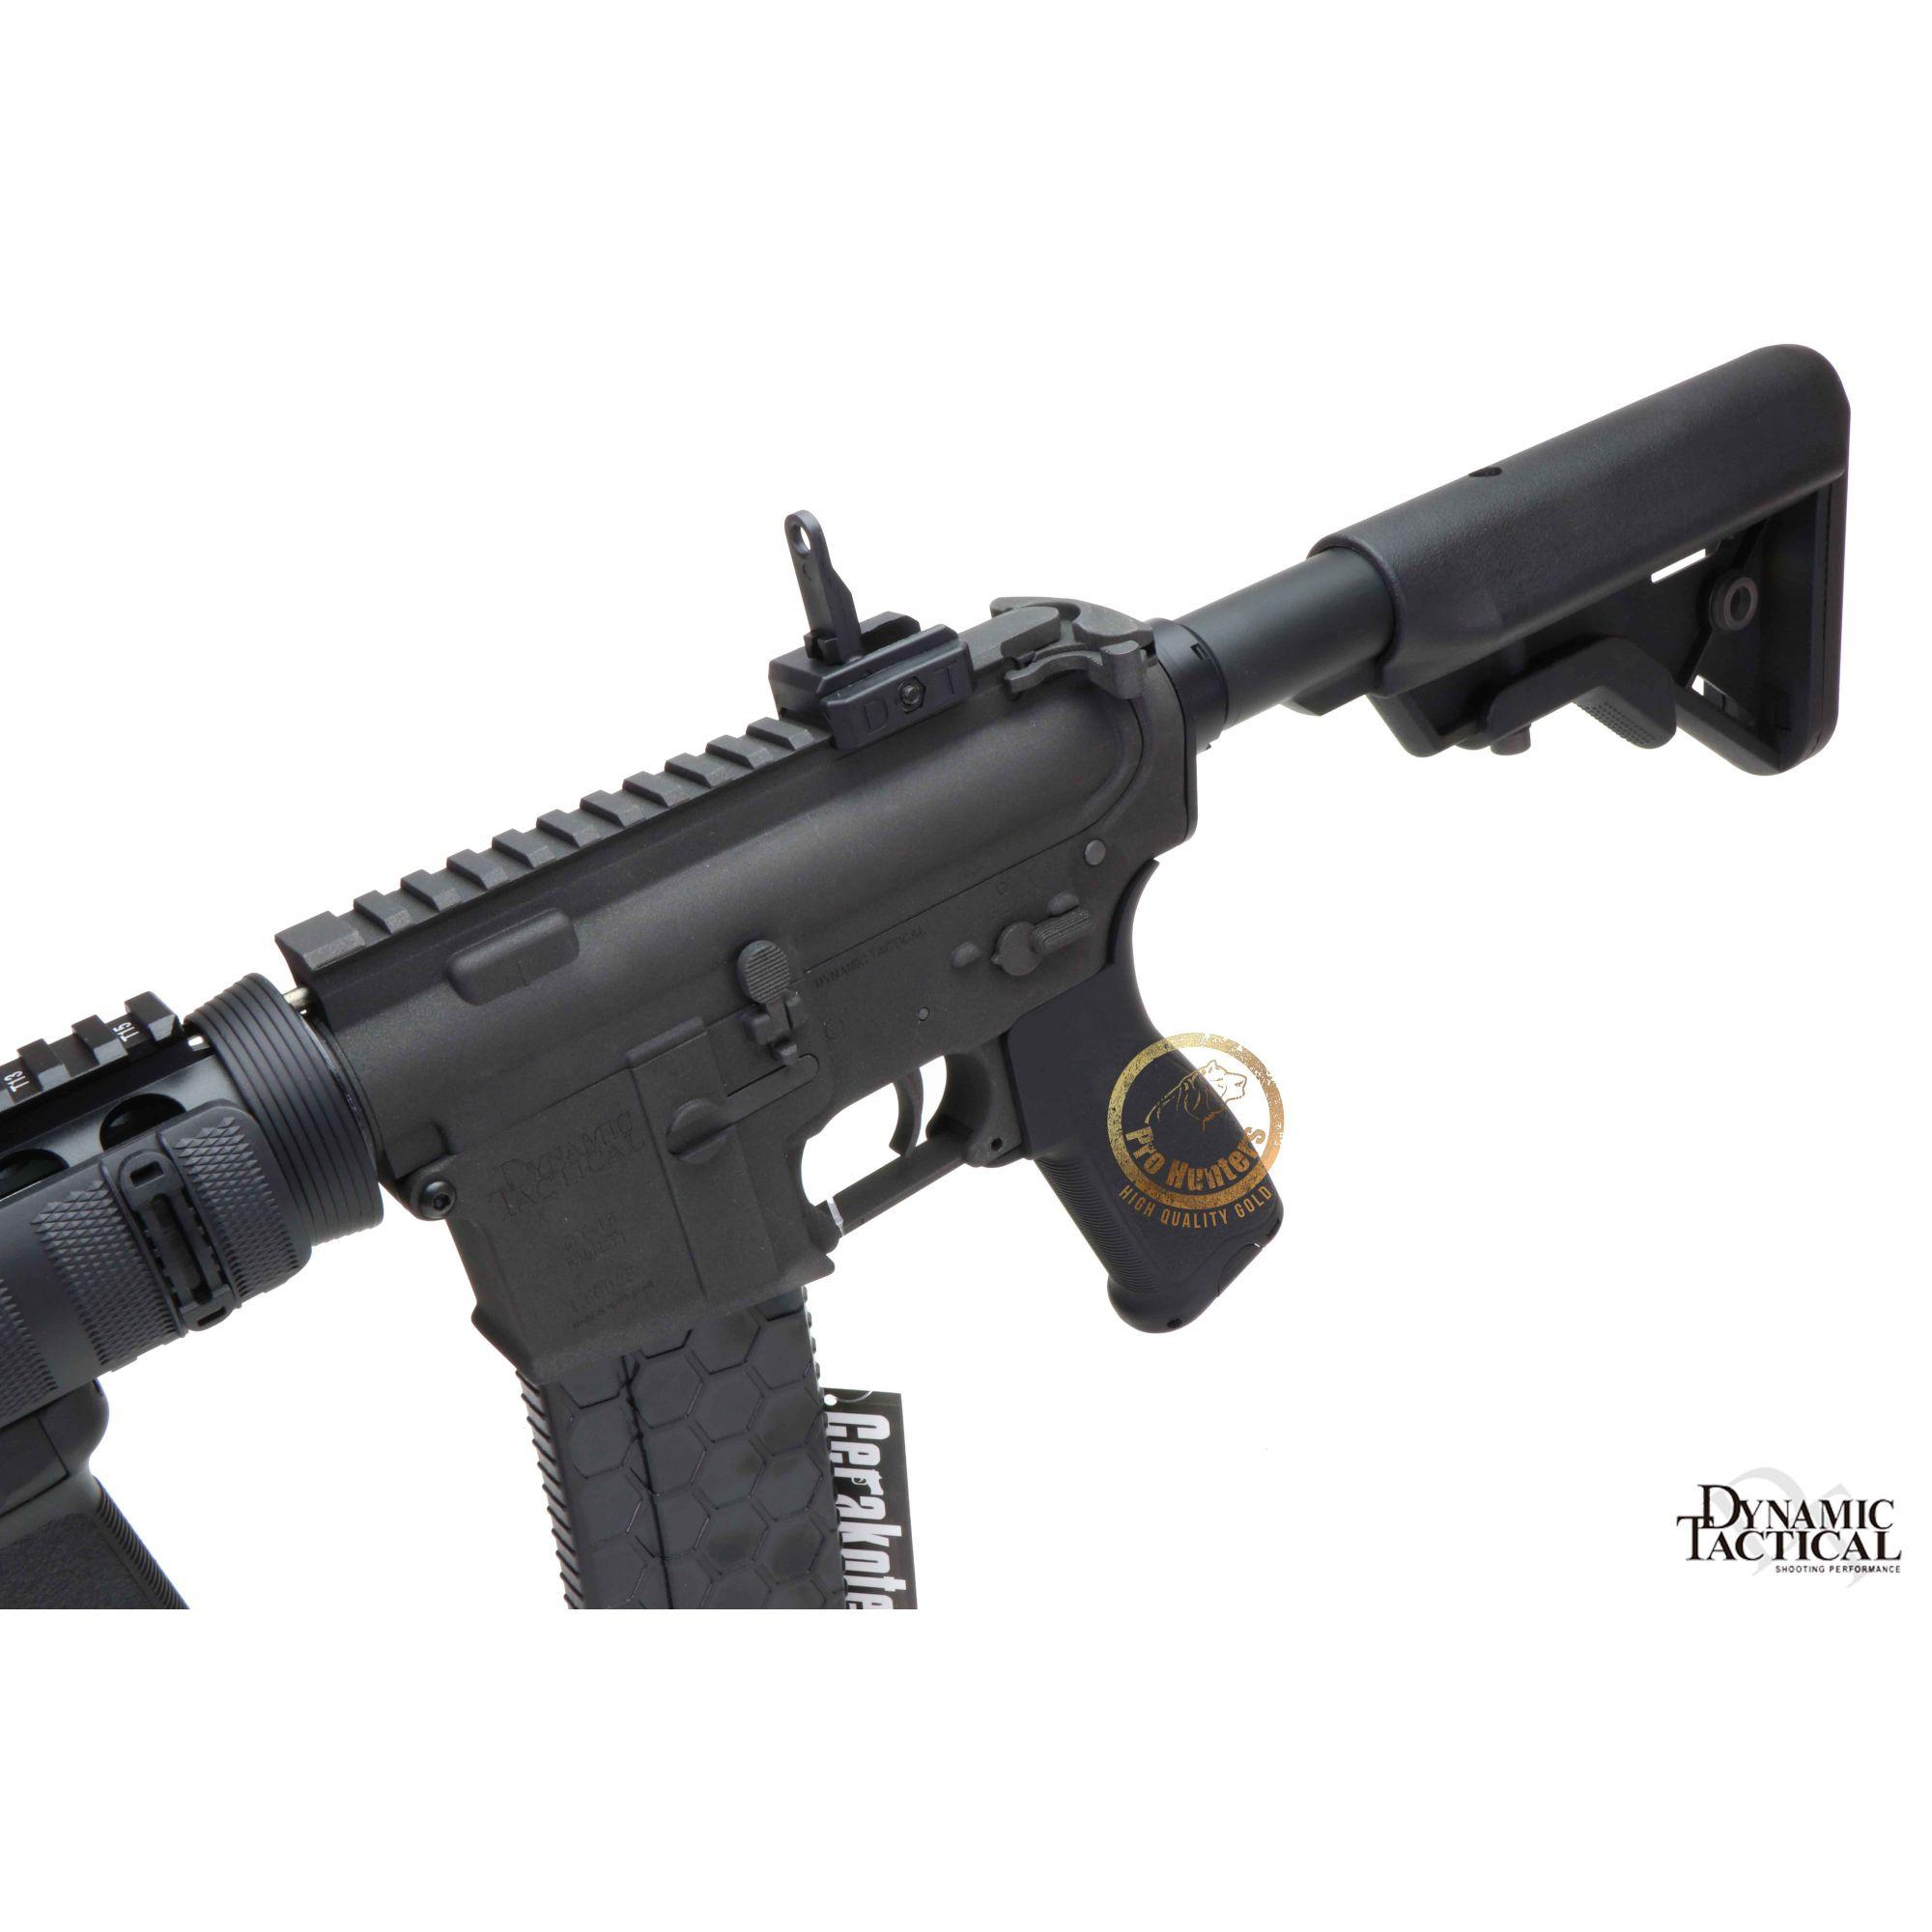 Rifle Airsoft Dytac M4 CQBR RIS 10.5 Polegadas - Black - FRETE GRÁTIS